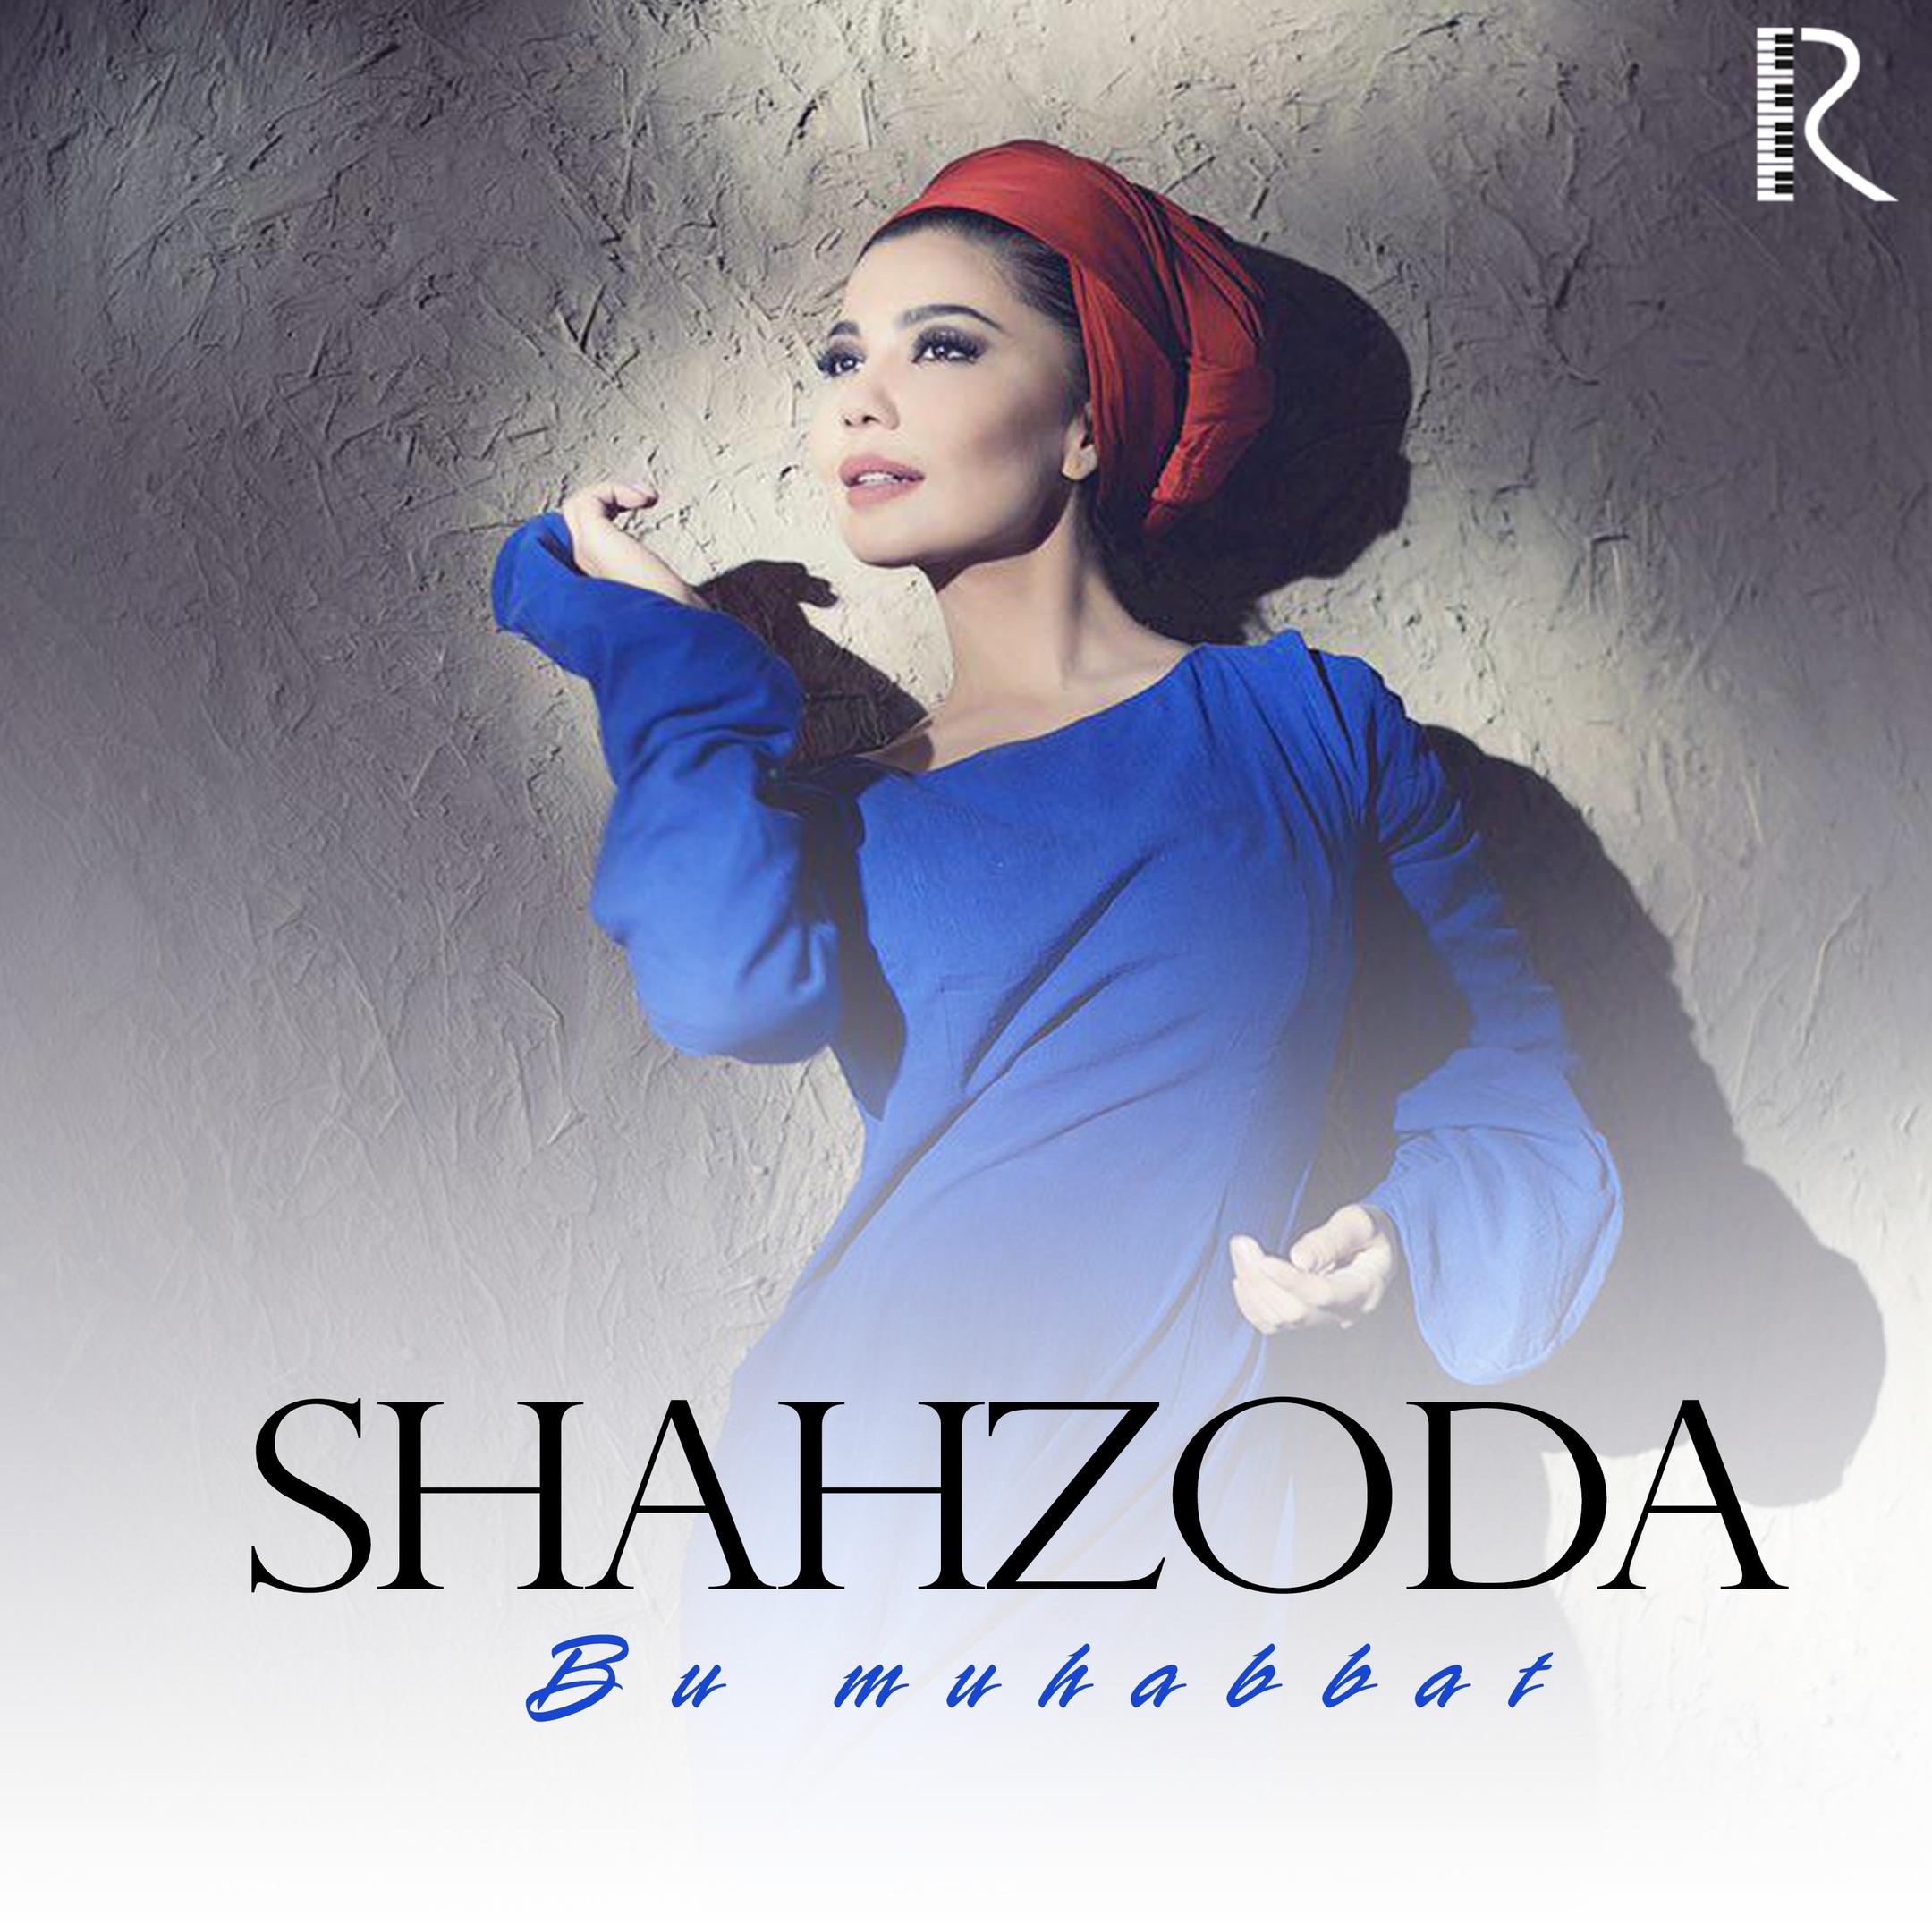 Shahzoda